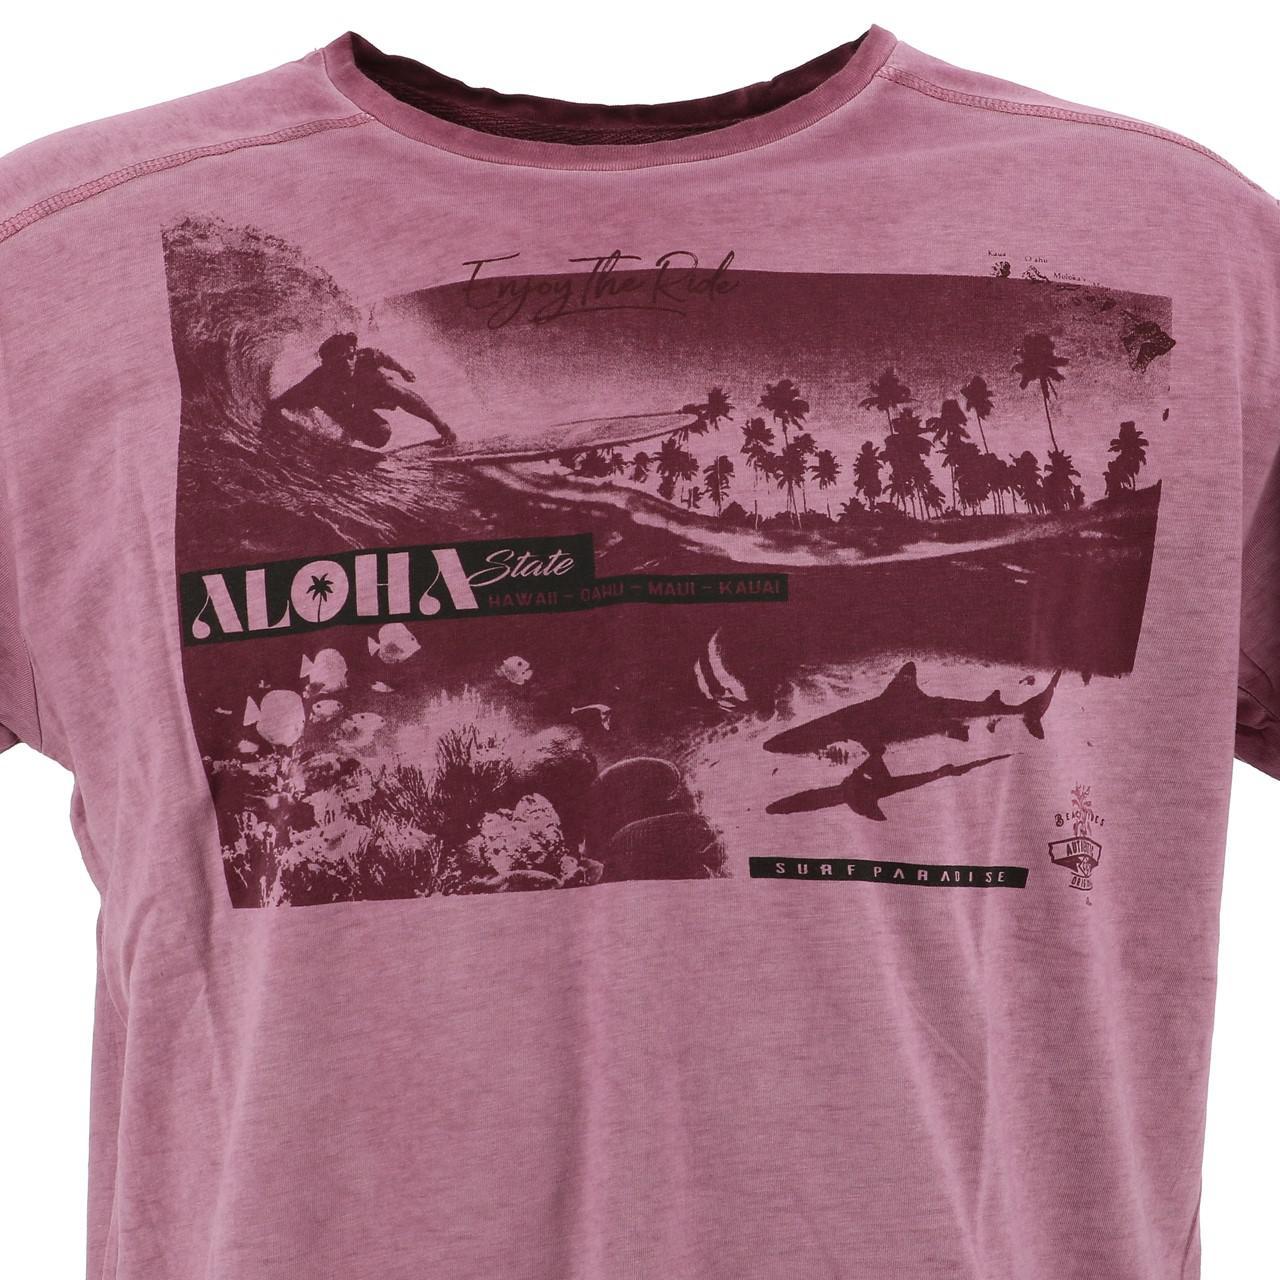 Short-Sleeve-T-Shirt-RMS-26-Shark-Wine-Mc-Tee-Red-18023-New thumbnail 2